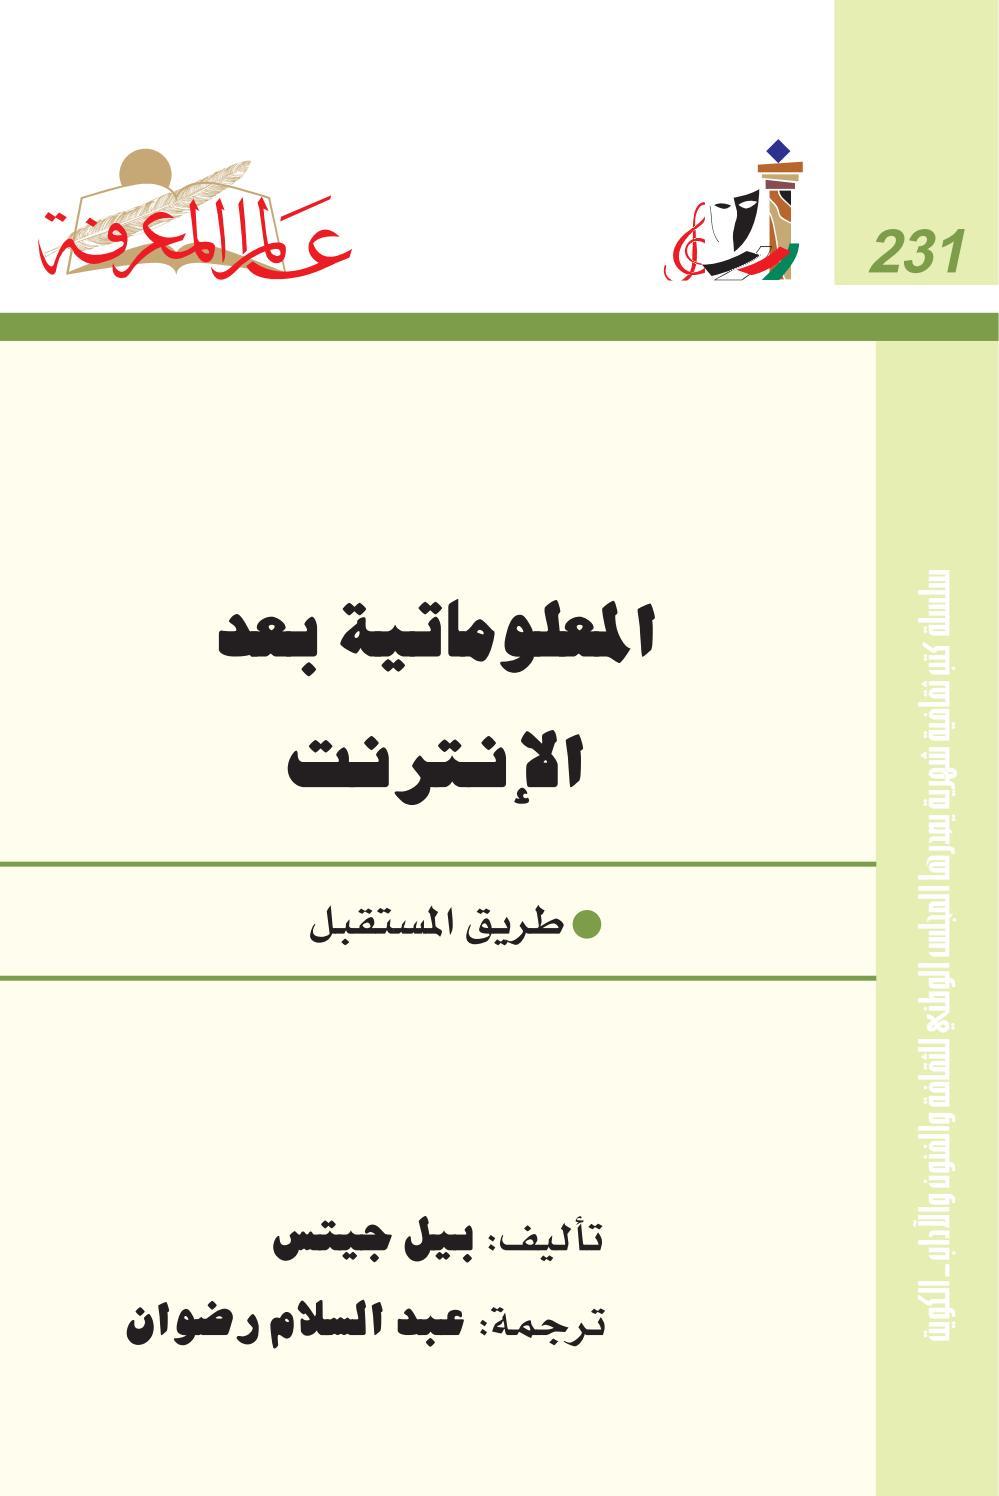 8ea47a092 231 المعلوماتية بعد الإنترنت by iReadPedia - issuu